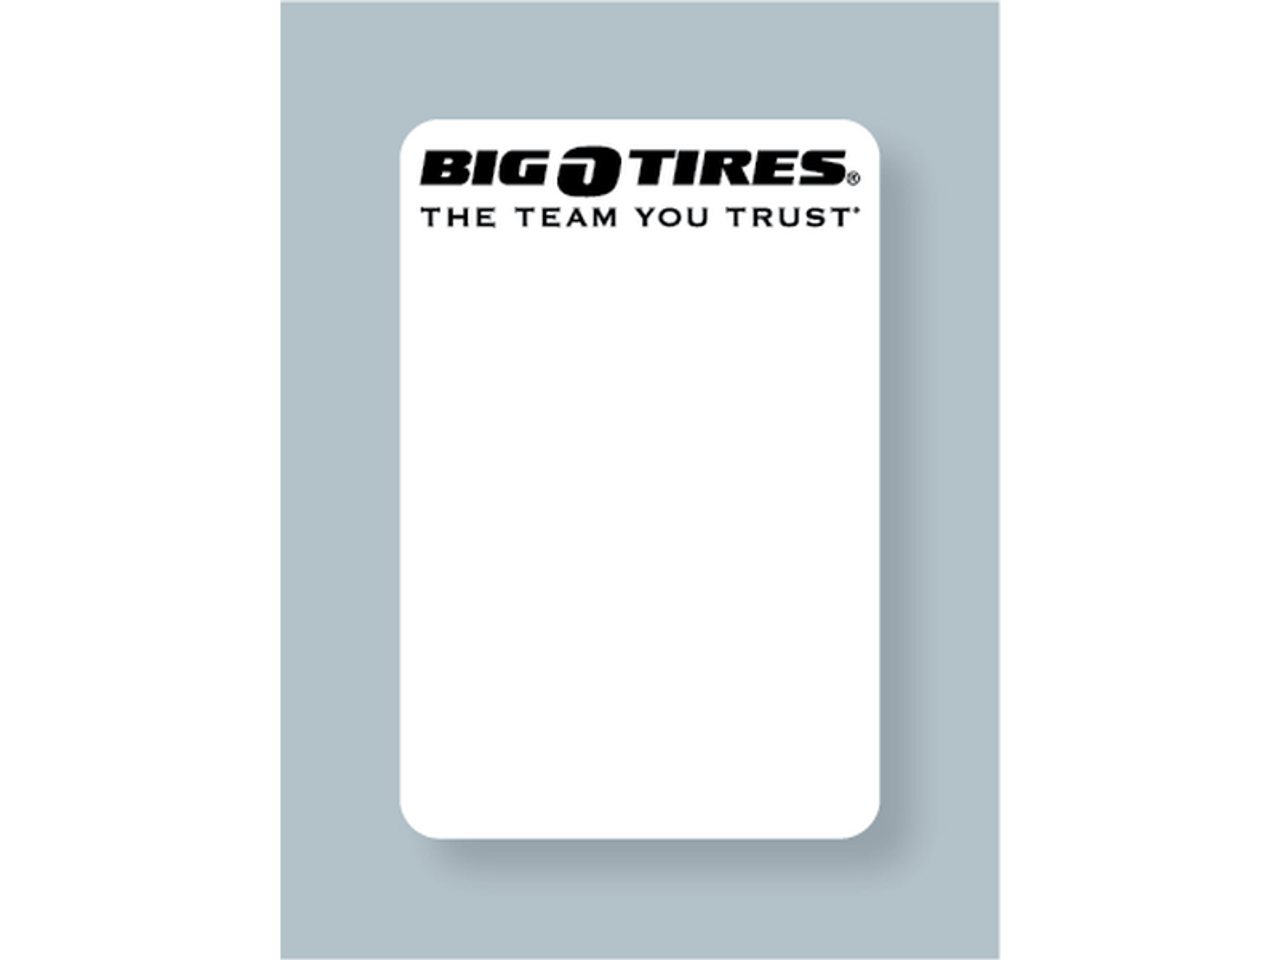 Big O Tires Oil Change Sticker - Blank for Printer Use